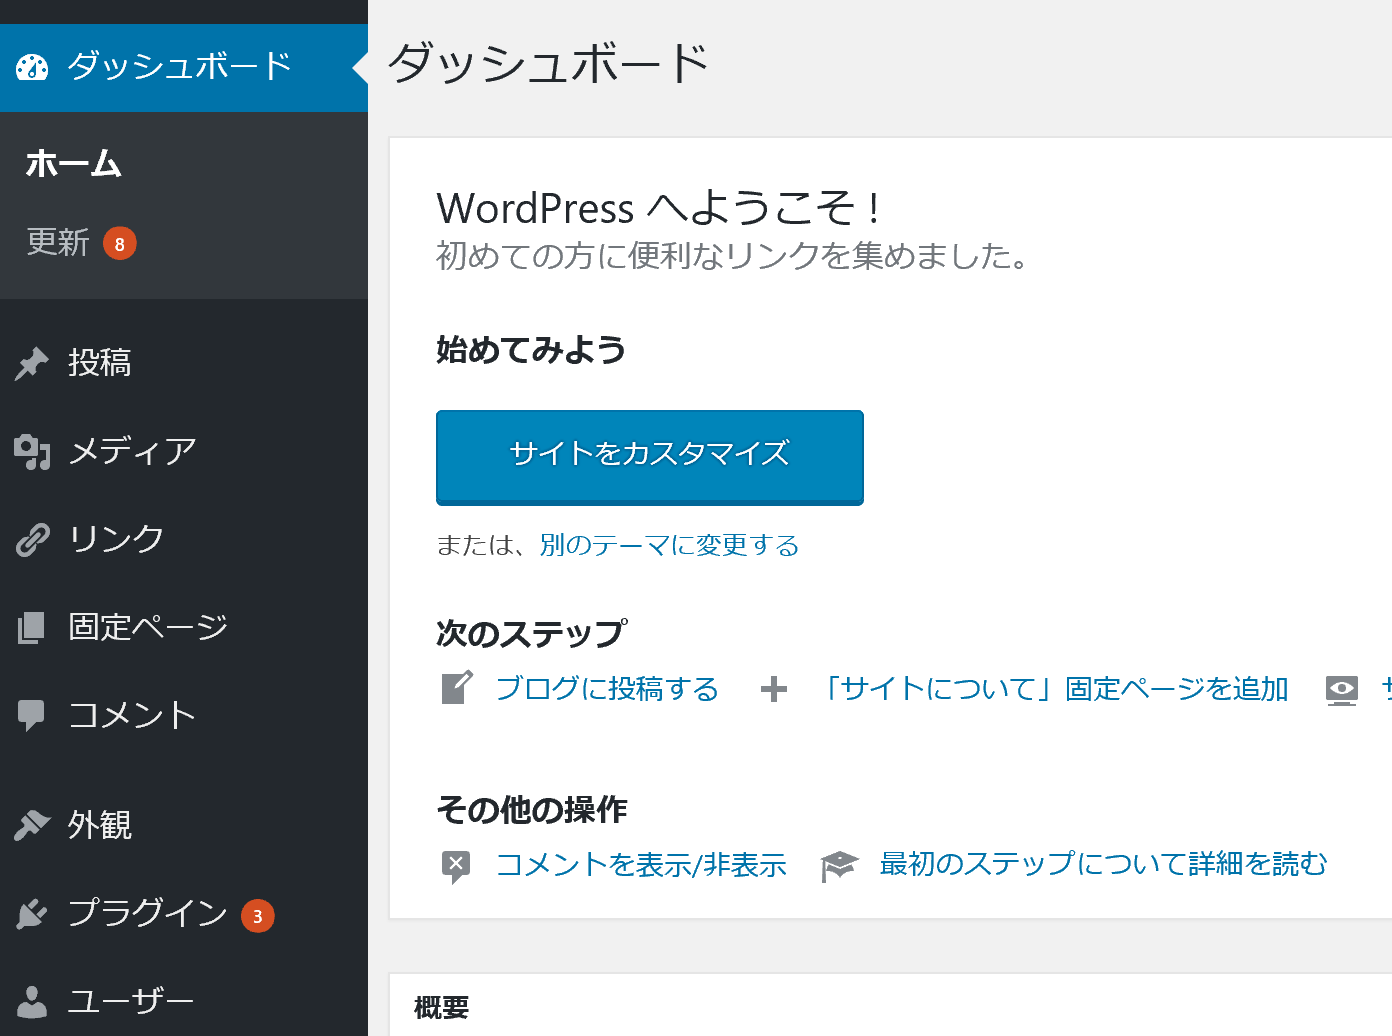 wpfirst - WordPressにログインできない9パターン!その対処方法を初心者向けに徹底解説